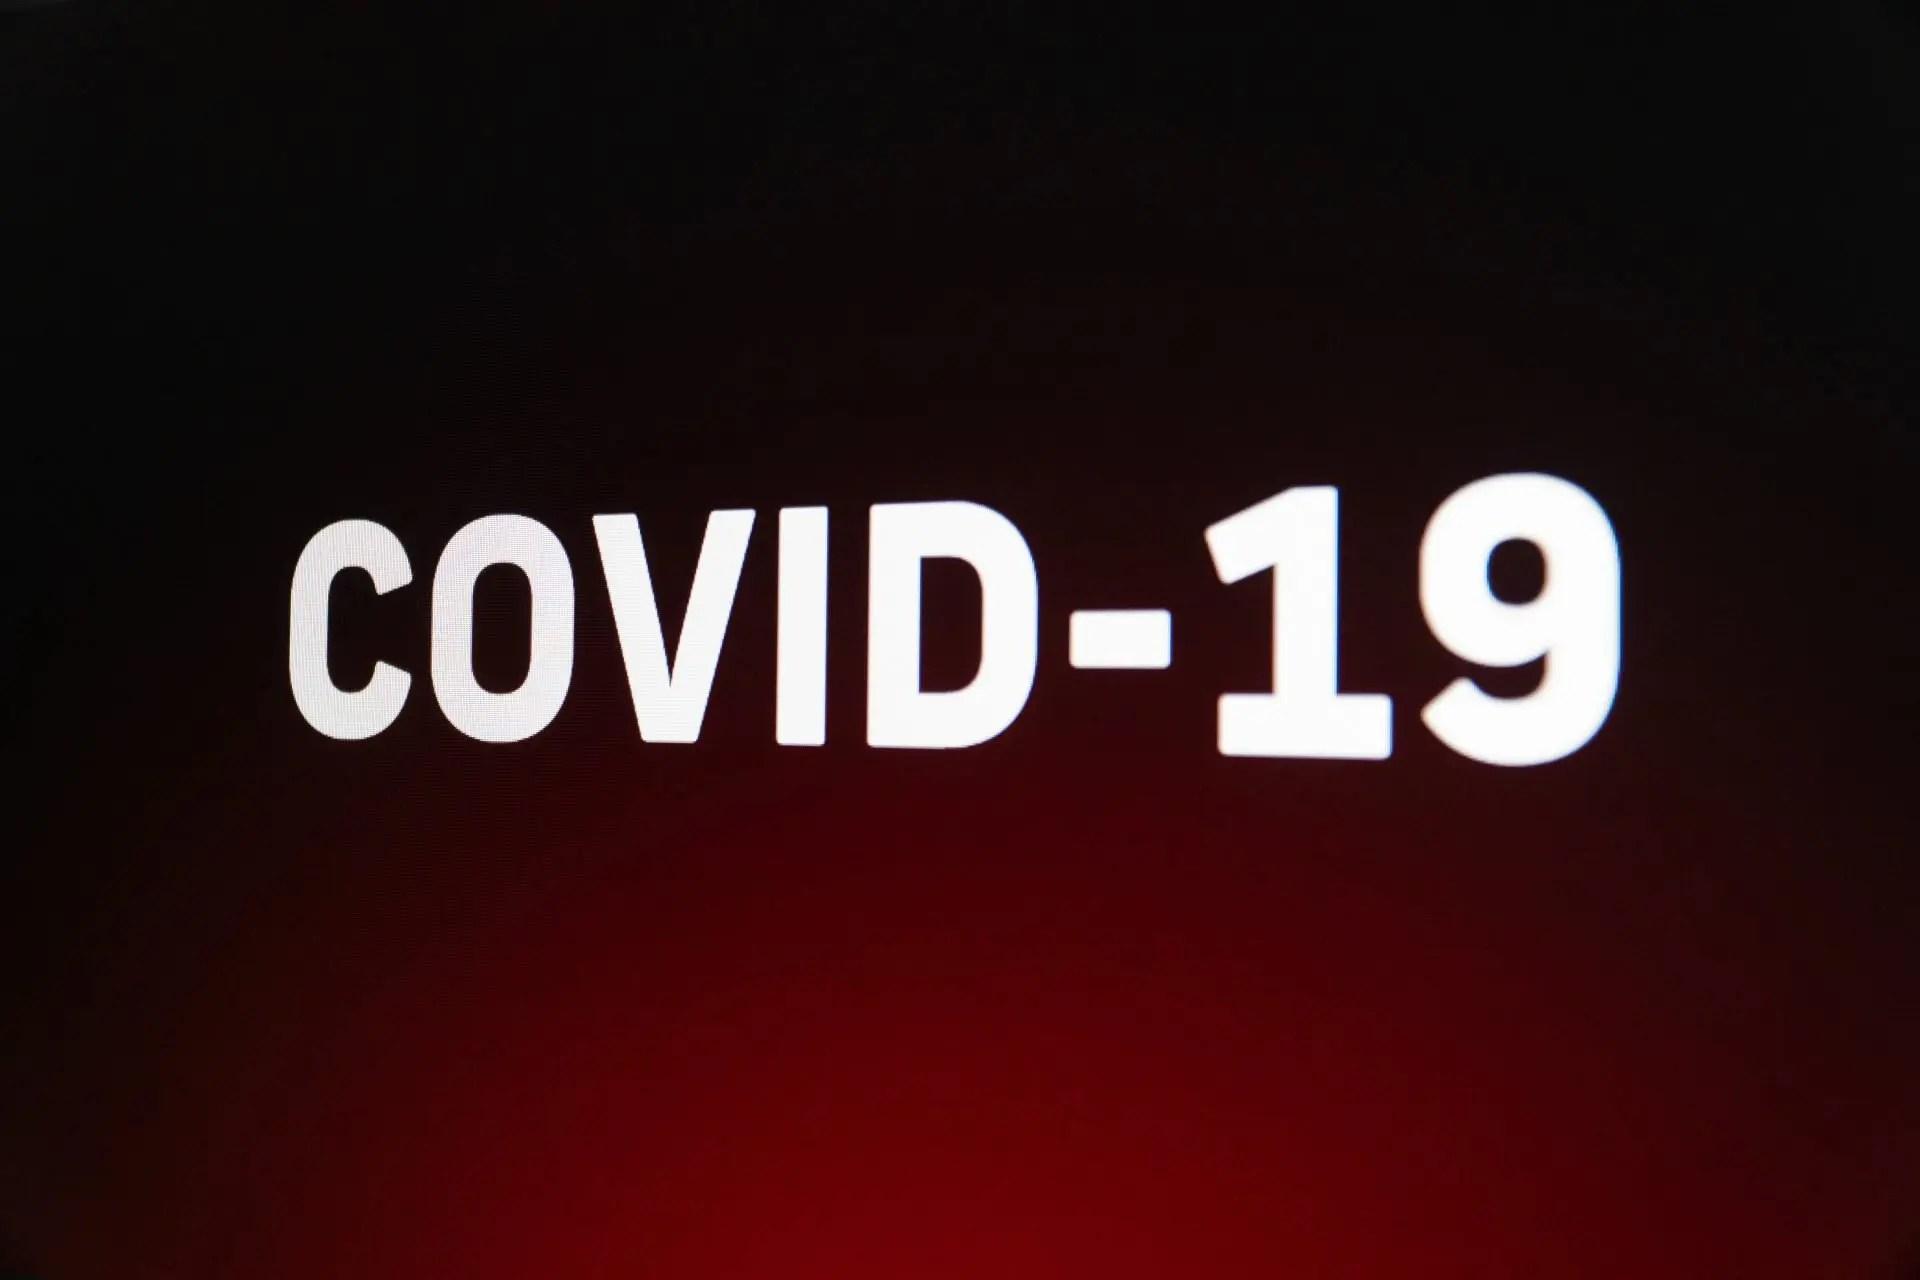 COVID-19 Outbreak – Cases Dashboard